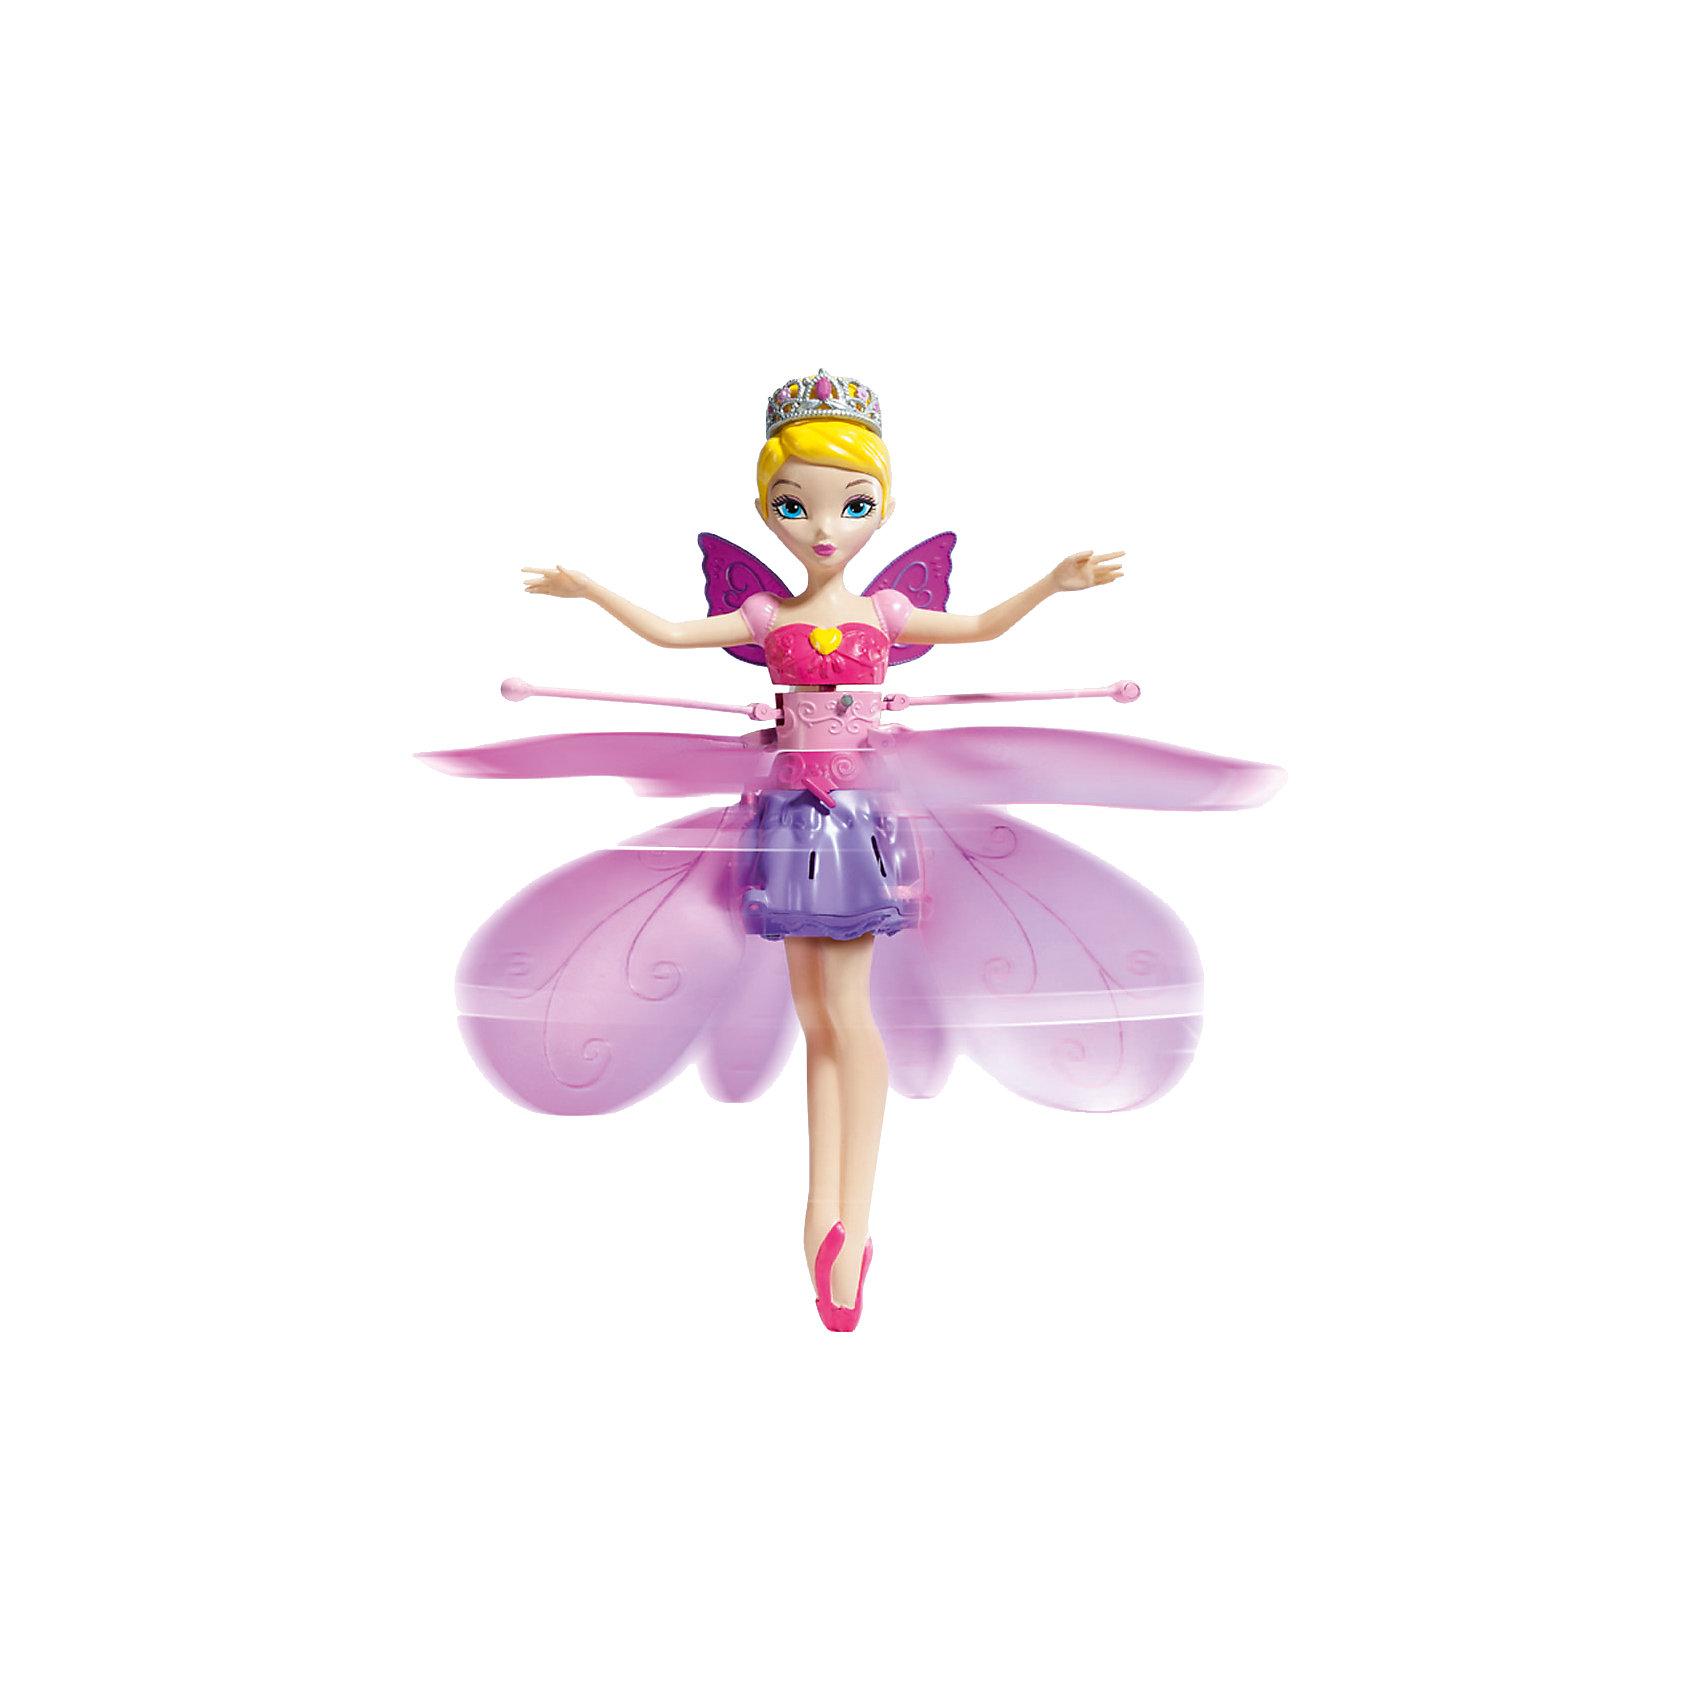 ���������, ������� � �������, Flying Fairy���������, ������� � �������, Flying Fairy (�������� ���), ����� � �������� ������ ������-����������� ����� � � ��������� ������� �� ������, ������ �� ���������� �������� � ������� �� ��������� ���������� �� ������ ��� ����� ������ �����������. ����� ��������� ���������, ���������� ��������� �� �����, ������������� �� ������ ������ ���������, �� ��������� ��������. ����� ��������� ����� �� ���������, ������� ��������� ������ � ����� ���, � �������� ��� ����� �������� ��������� �������� ������������!<br><br>��������������:<br>-����� �������: 5-30 ����� (�������-������)<br>-�������� ������� �� USB<br>-����� ����: ����� 5 ���<br>-����� ������� ����� ������� �����������, � ������ ����������� ���� � ��������� ������ <br>-������������ �������� � �������� ����� ������<br>-������� ������ ��������� ������ � ��� � �������� ������� �����<br>-������� ����������� � ����� ������������: �����-����, ������-�����<br><br>������������: �����, ��������� (�������� ���������� + ��������� ��� �������), USB-������, ����������<br><br>�������������� ����������:<br>-���������: �������<br>-������� � ��������: 20�8�28 ��<br>-��� � ��������: 250 �<br>-�������: �� 6 �������� �� (� �������� �� ������) <br><br>���������, ������� � �������, ������ �������� �������� �� ����� ���, ���� ��������� ������� ��-���������� ������������ � �� ������� ����������� �� ���� �������!<br><br>���������, ������� � �������, Flying Fairy (�������� ���) ����� ������ � ����� ��������.<br><br>������ ��: 284<br>������� ��: 203<br>������ ��: 86<br>��� �: 189<br>������� �� �������: 36<br>������� �� �������: 96<br>���: �������<br>�������: �������<br>SKU: 4035044